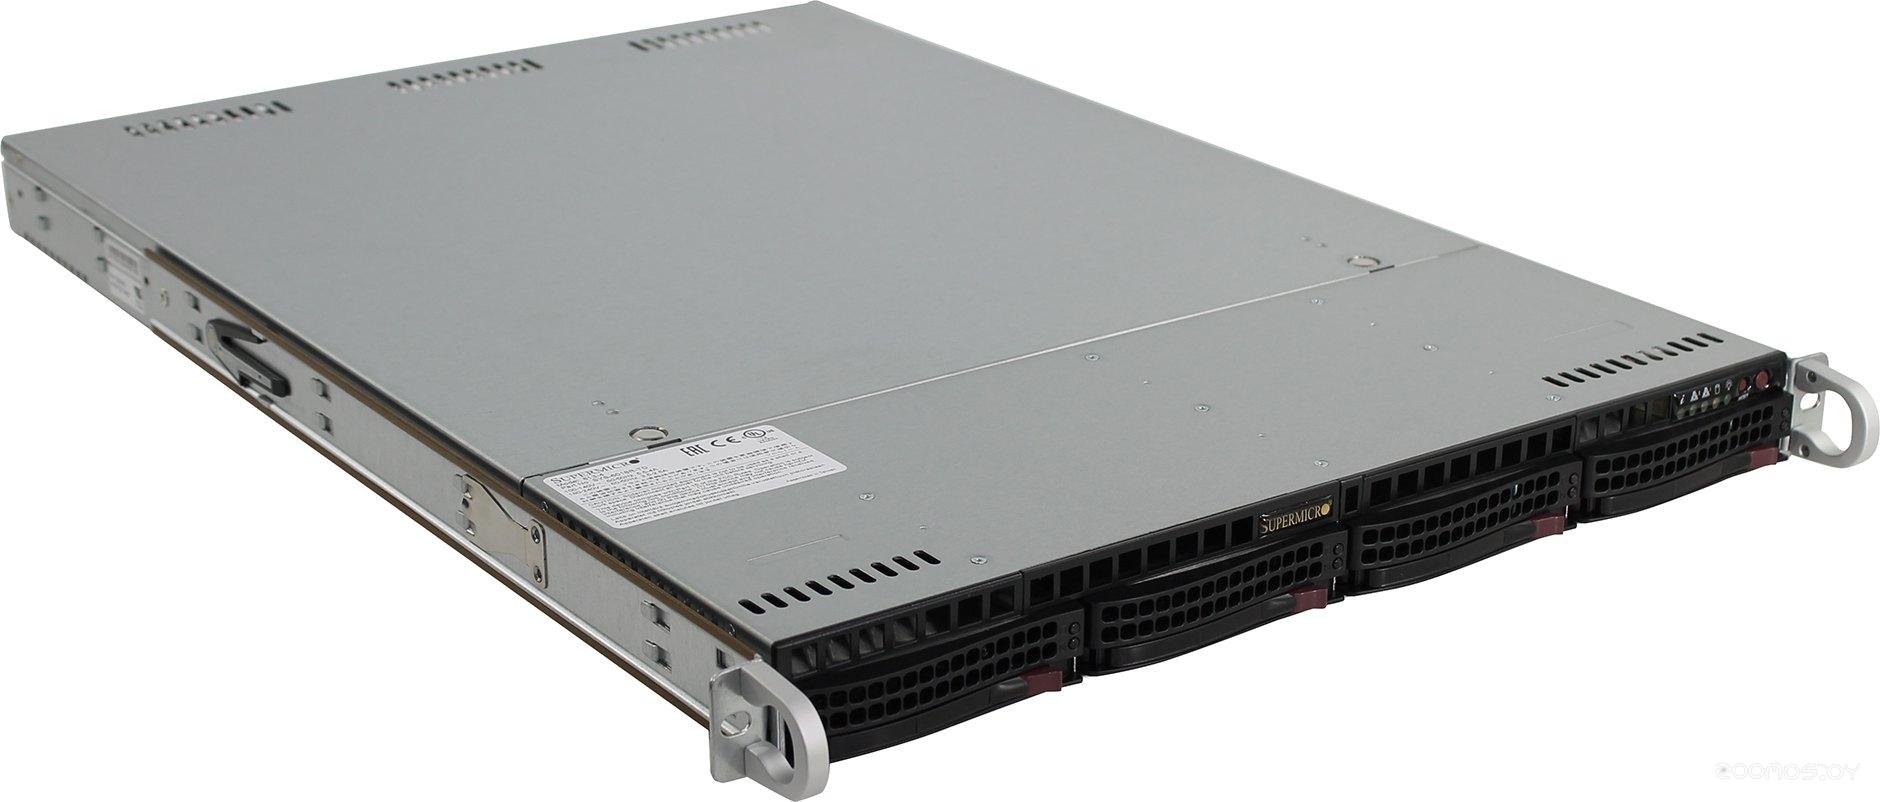 Серверная платформа Supermicro SYS-6018R-TD